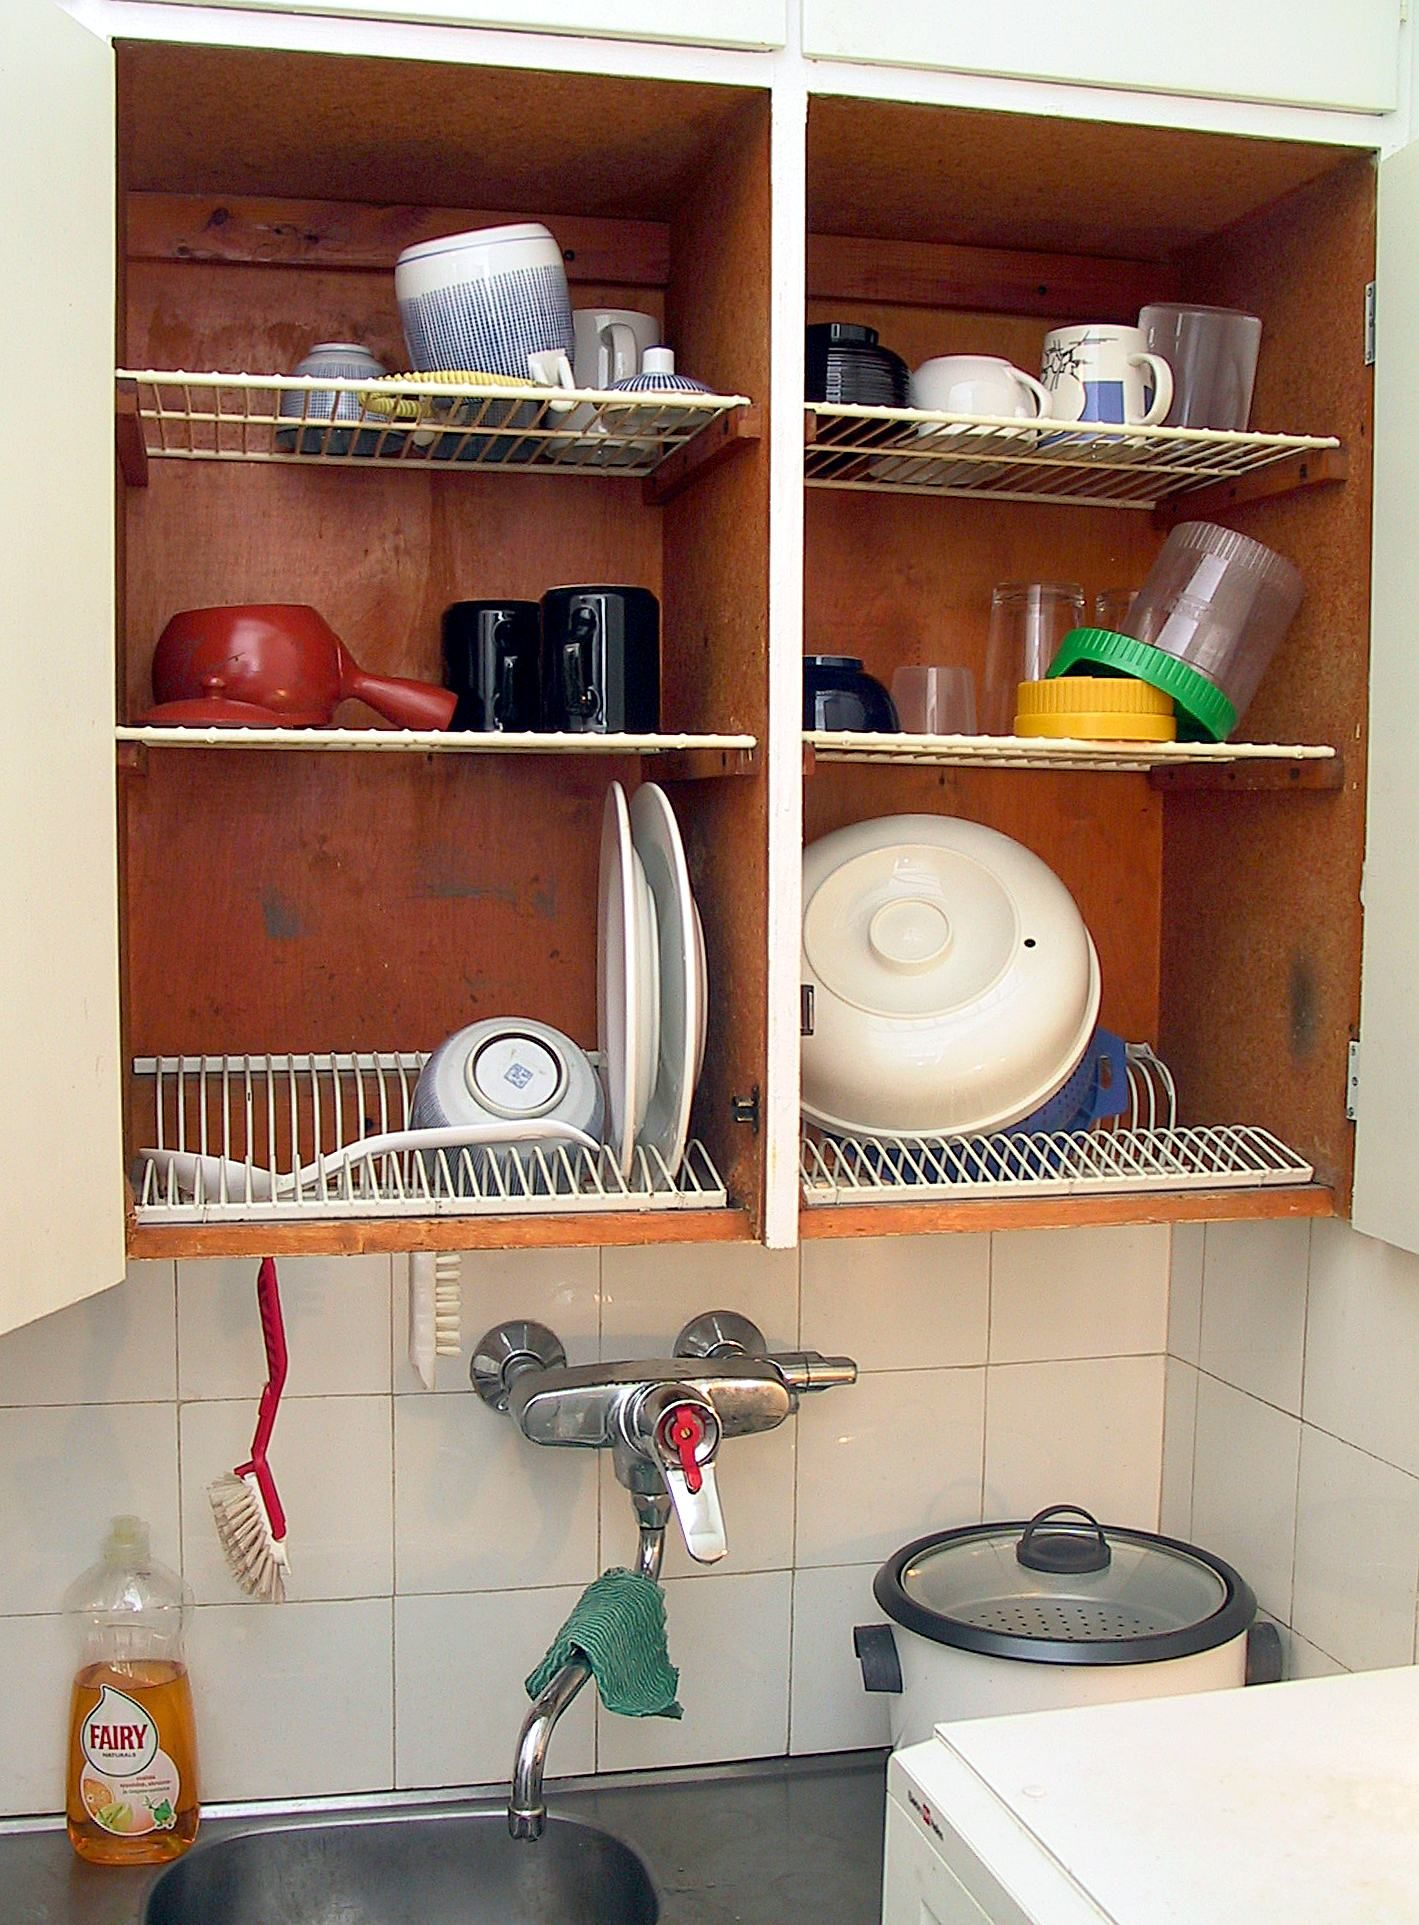 Finnish dish draining closet http://en.wikipedia.org/wiki/Dish_drai ...